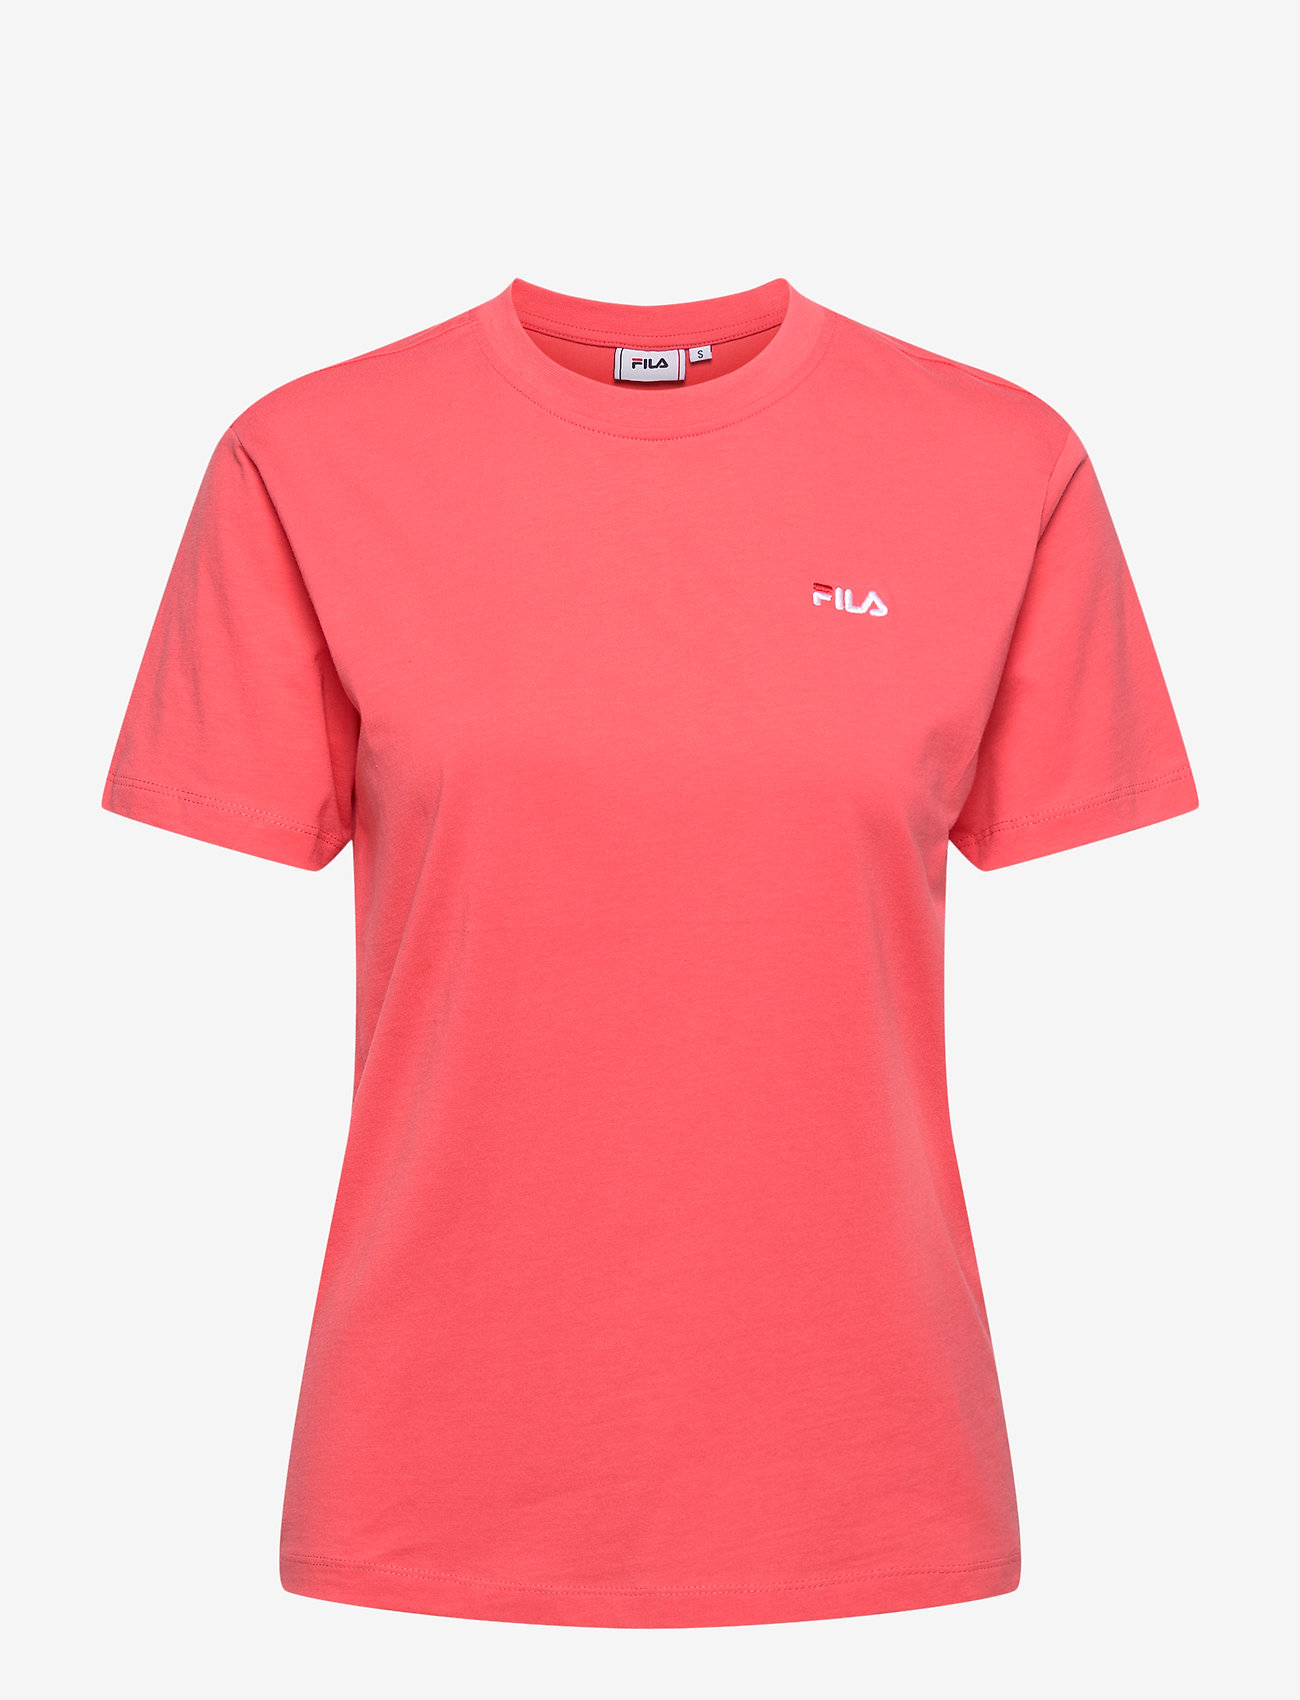 FILA - WOMEN EARA tee - t-shirts - calypso coral - 0